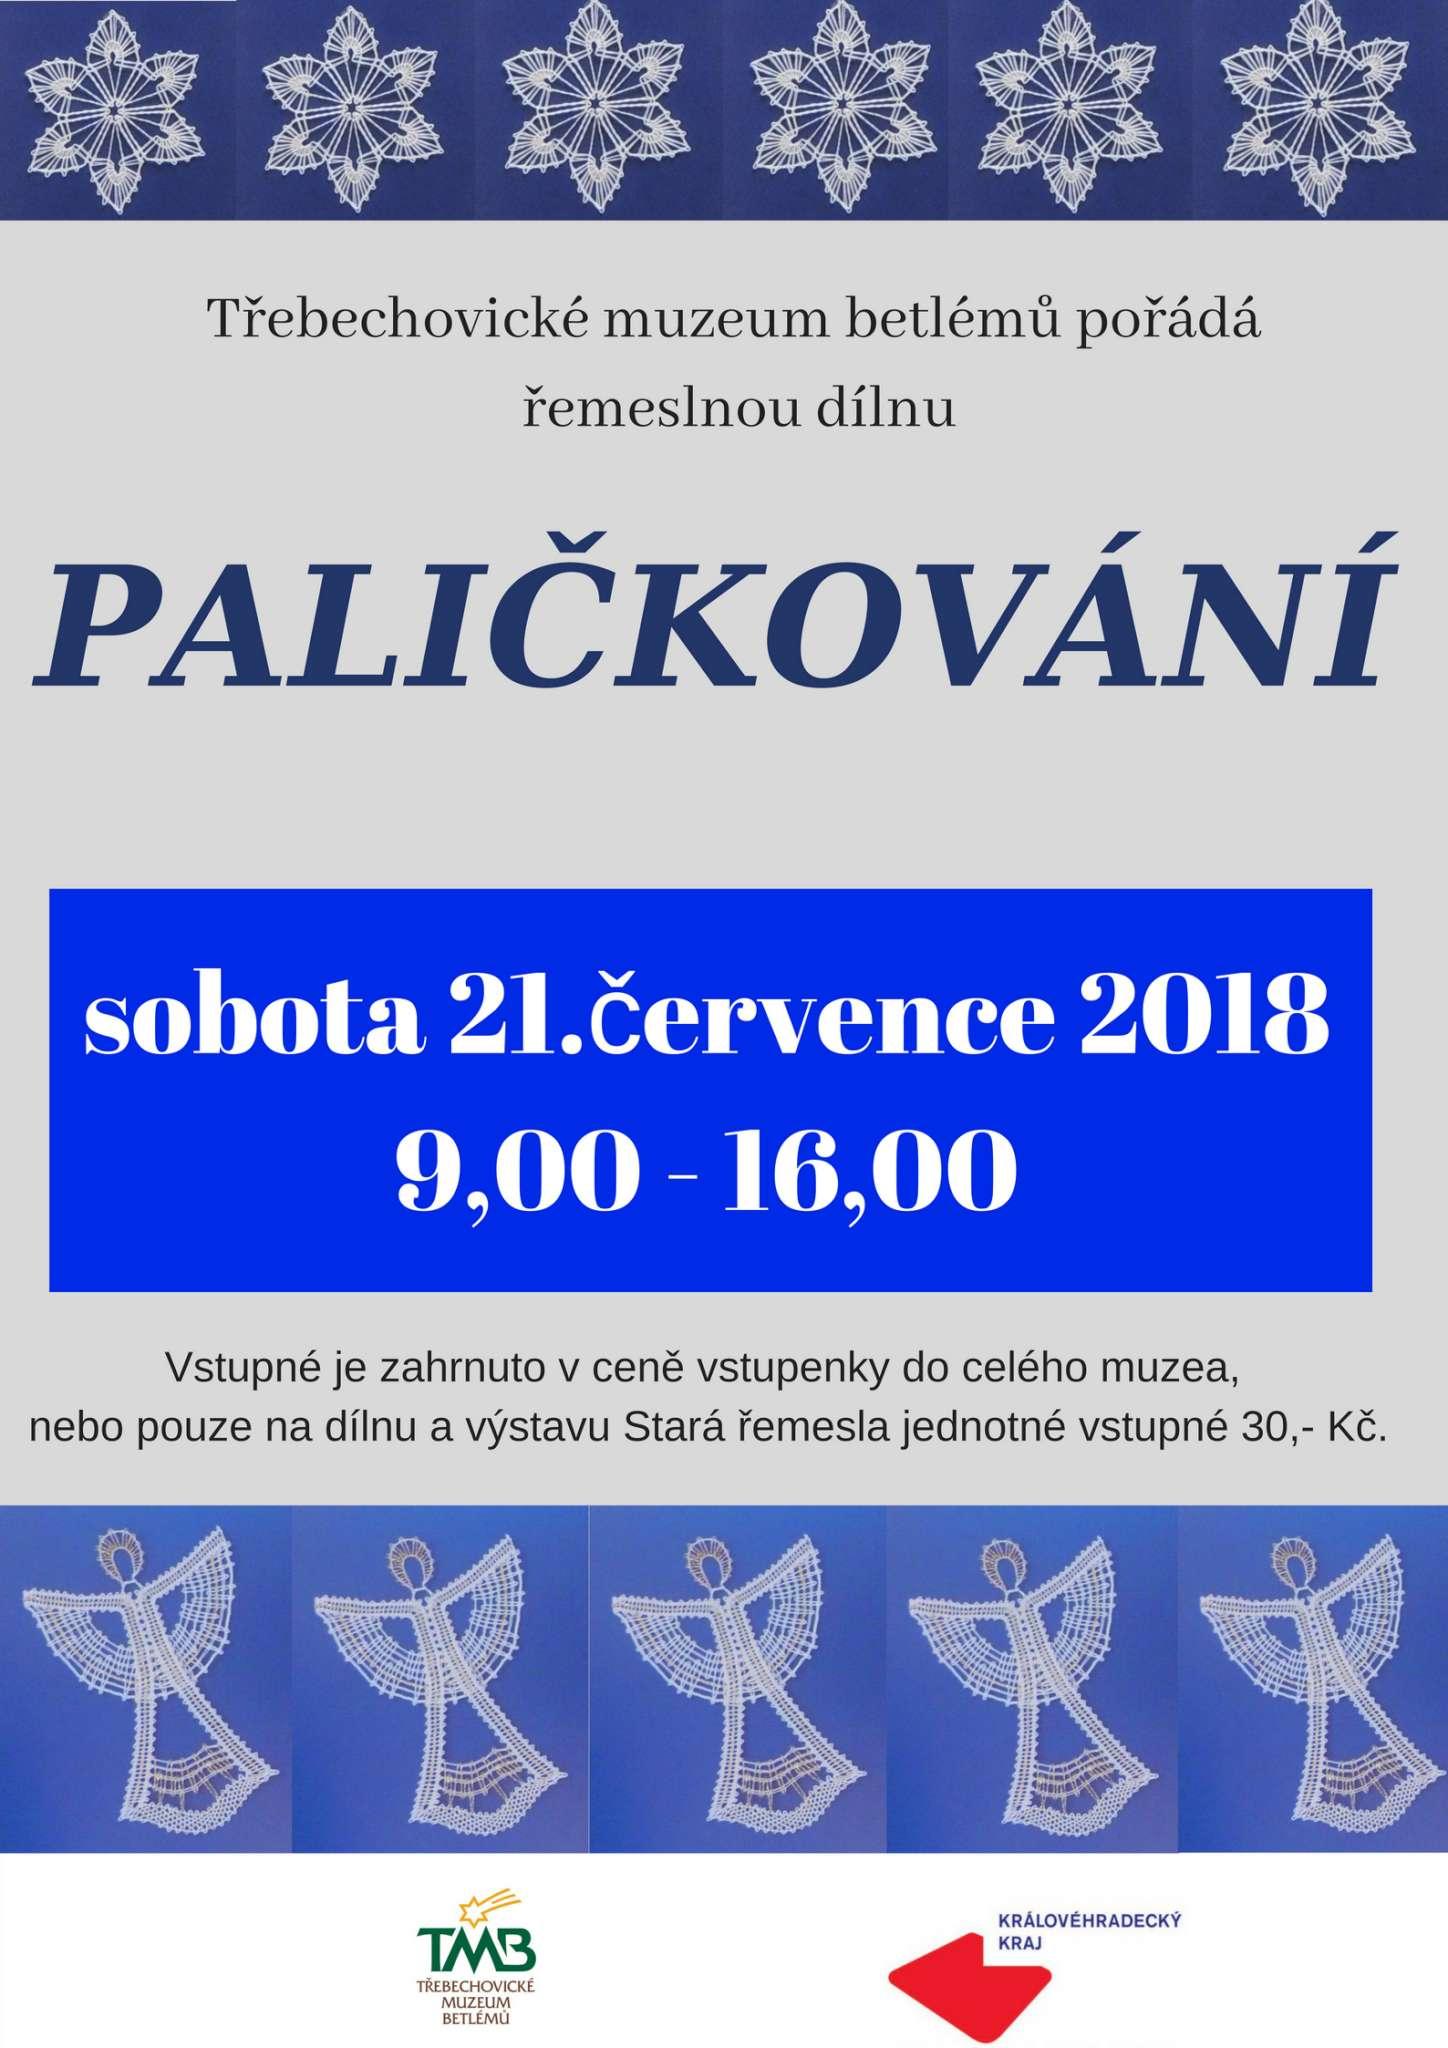 palickovani-trebechovice-21-7-2018-2048